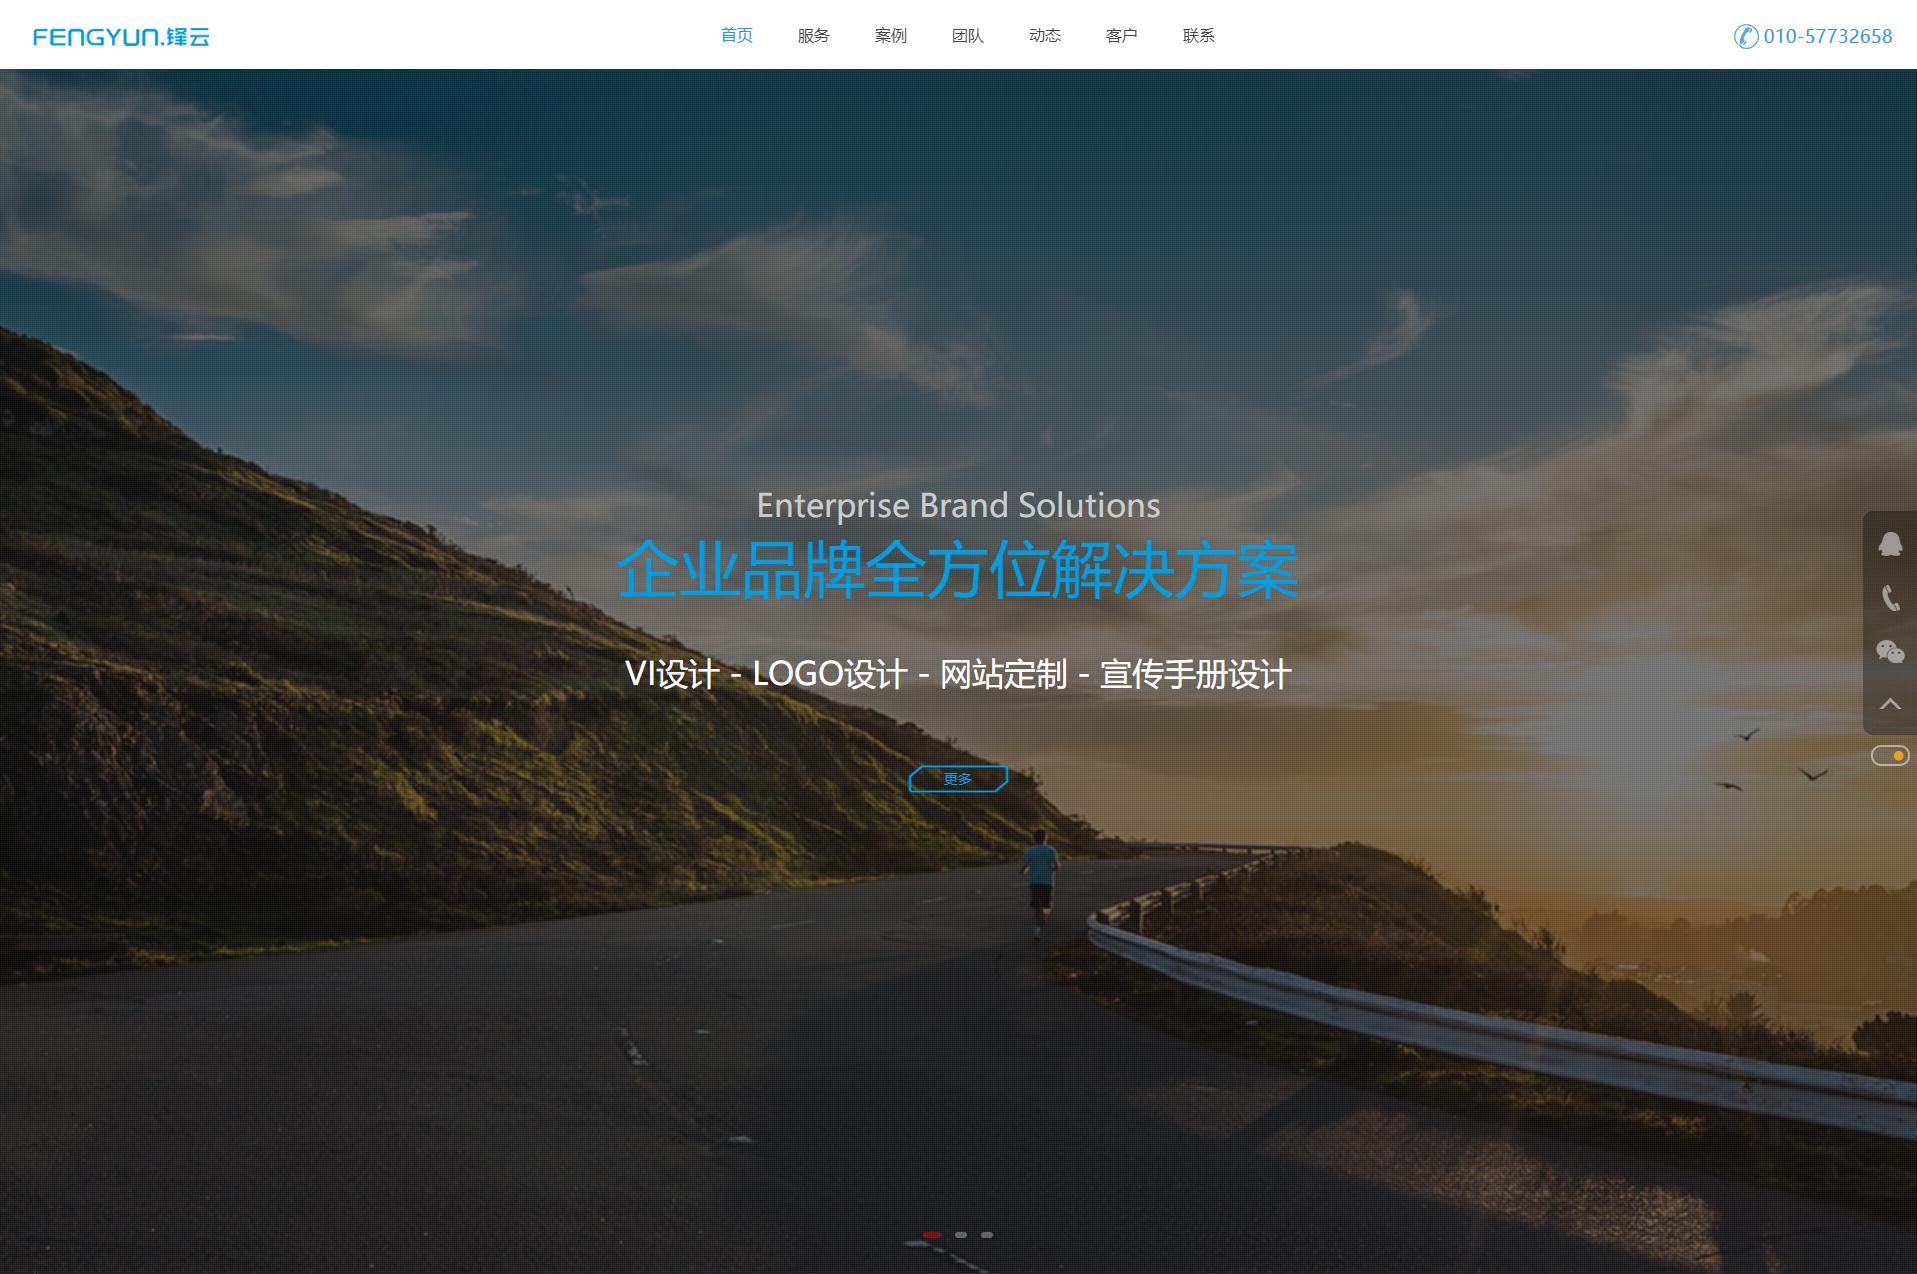 HTML5网络技术公司网站模板插图